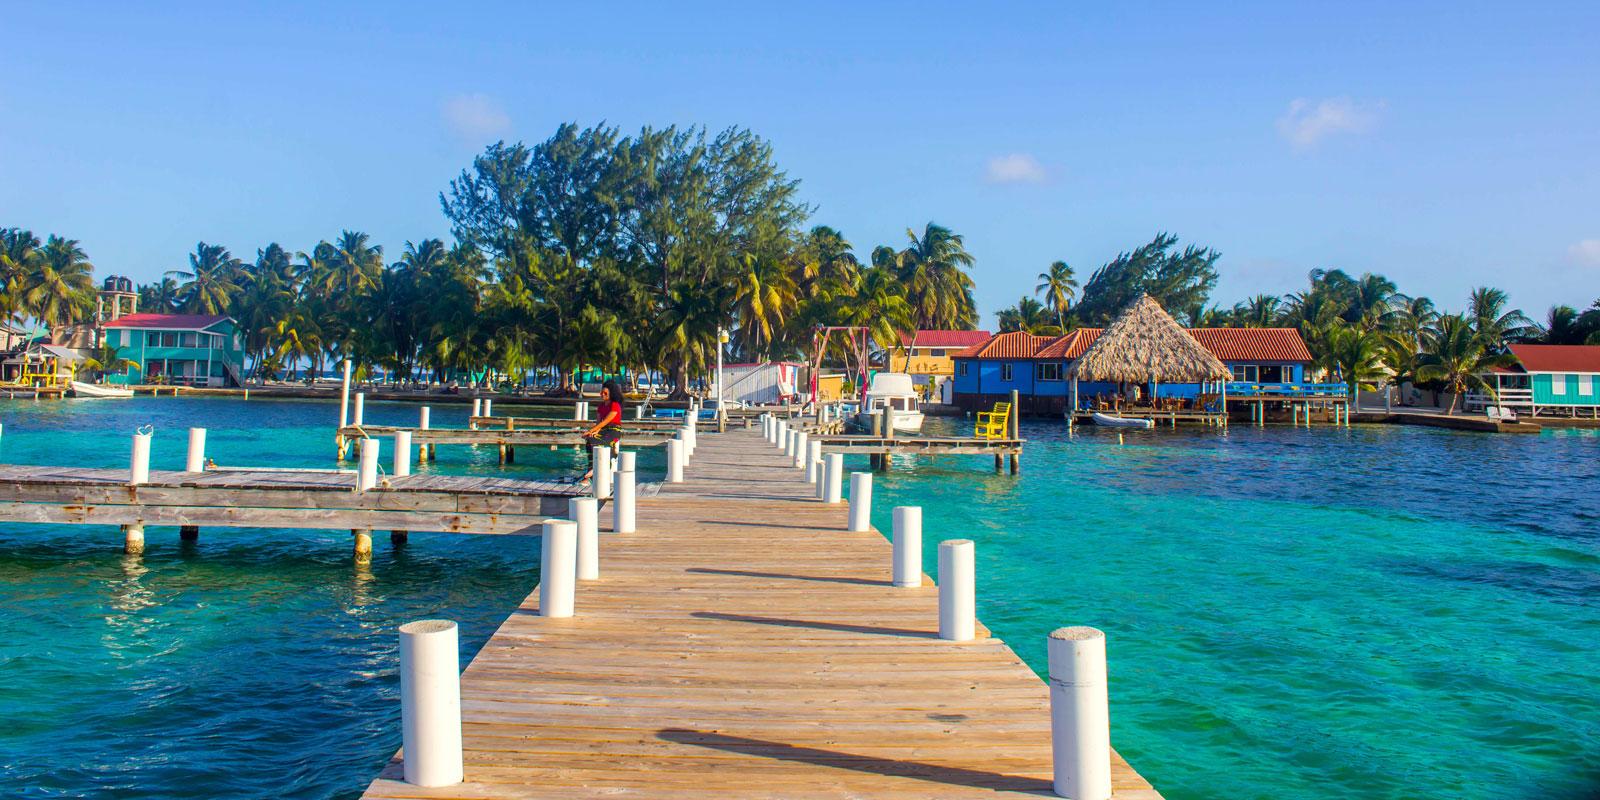 BLUE MARLIN BEACH RESORT - A Belize Private Island Resort